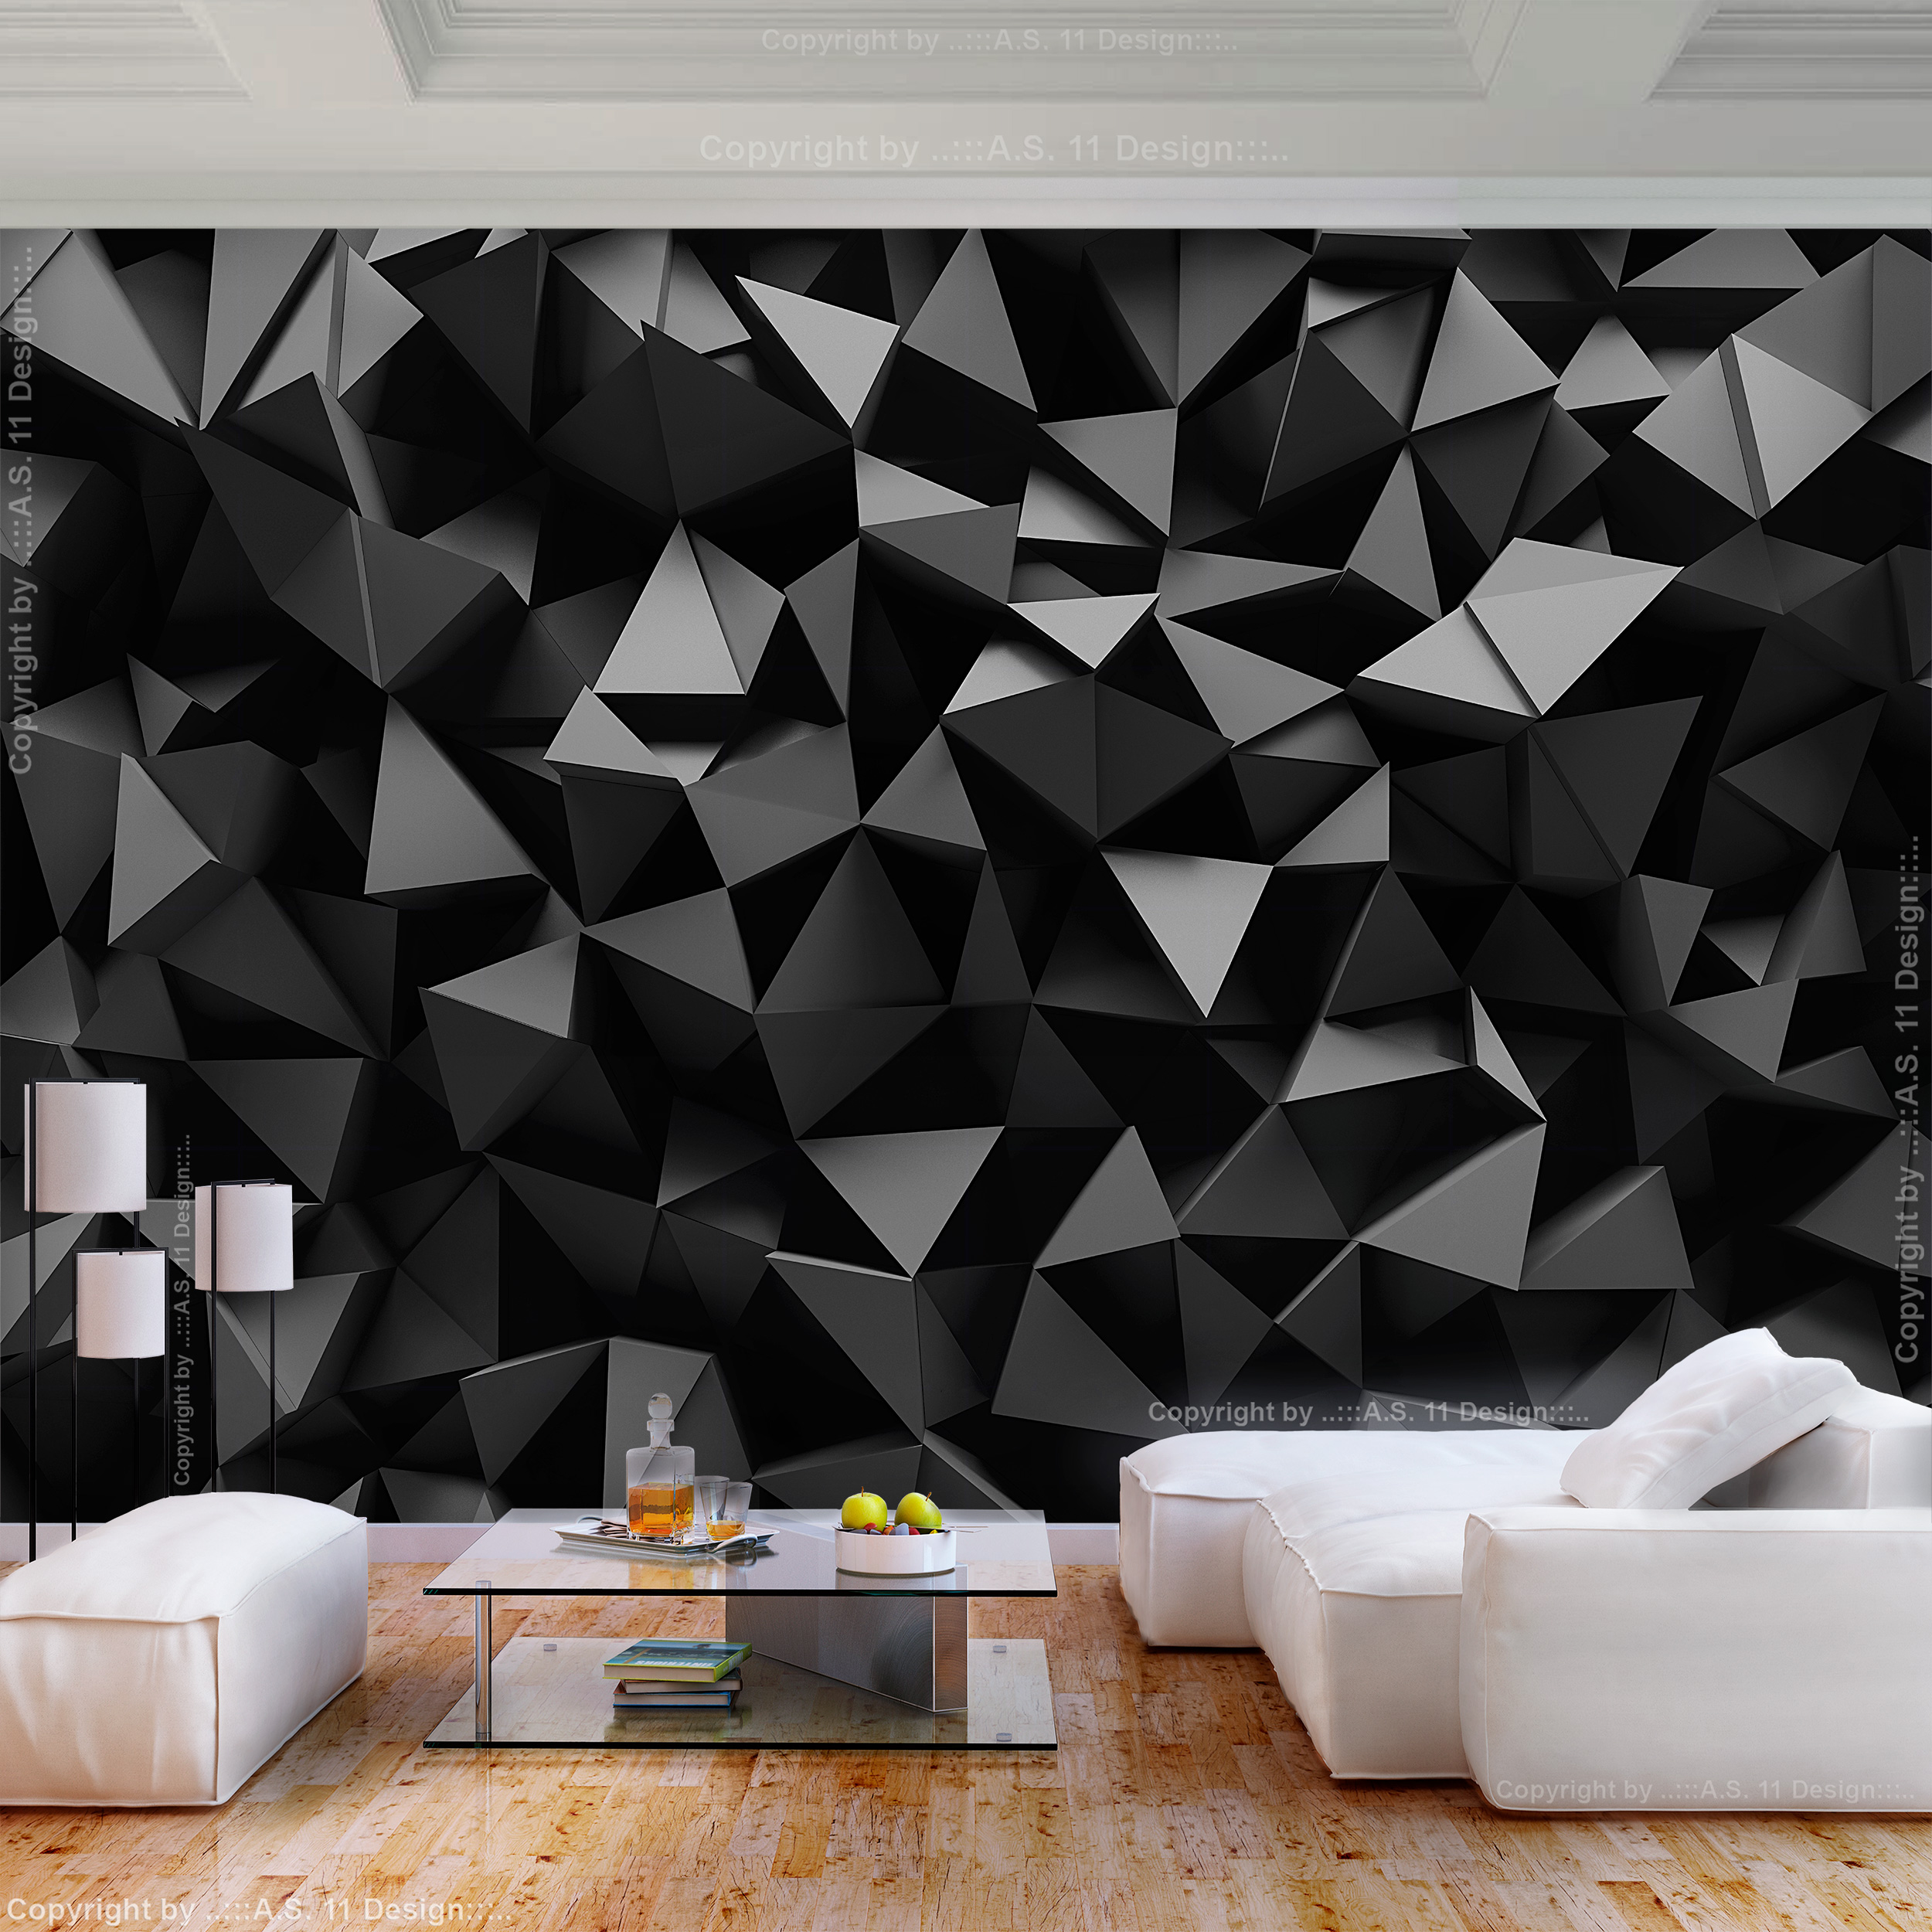 Vlies fototapete abstrakt schwarz 3d effekt tapete for 3d tapete grau